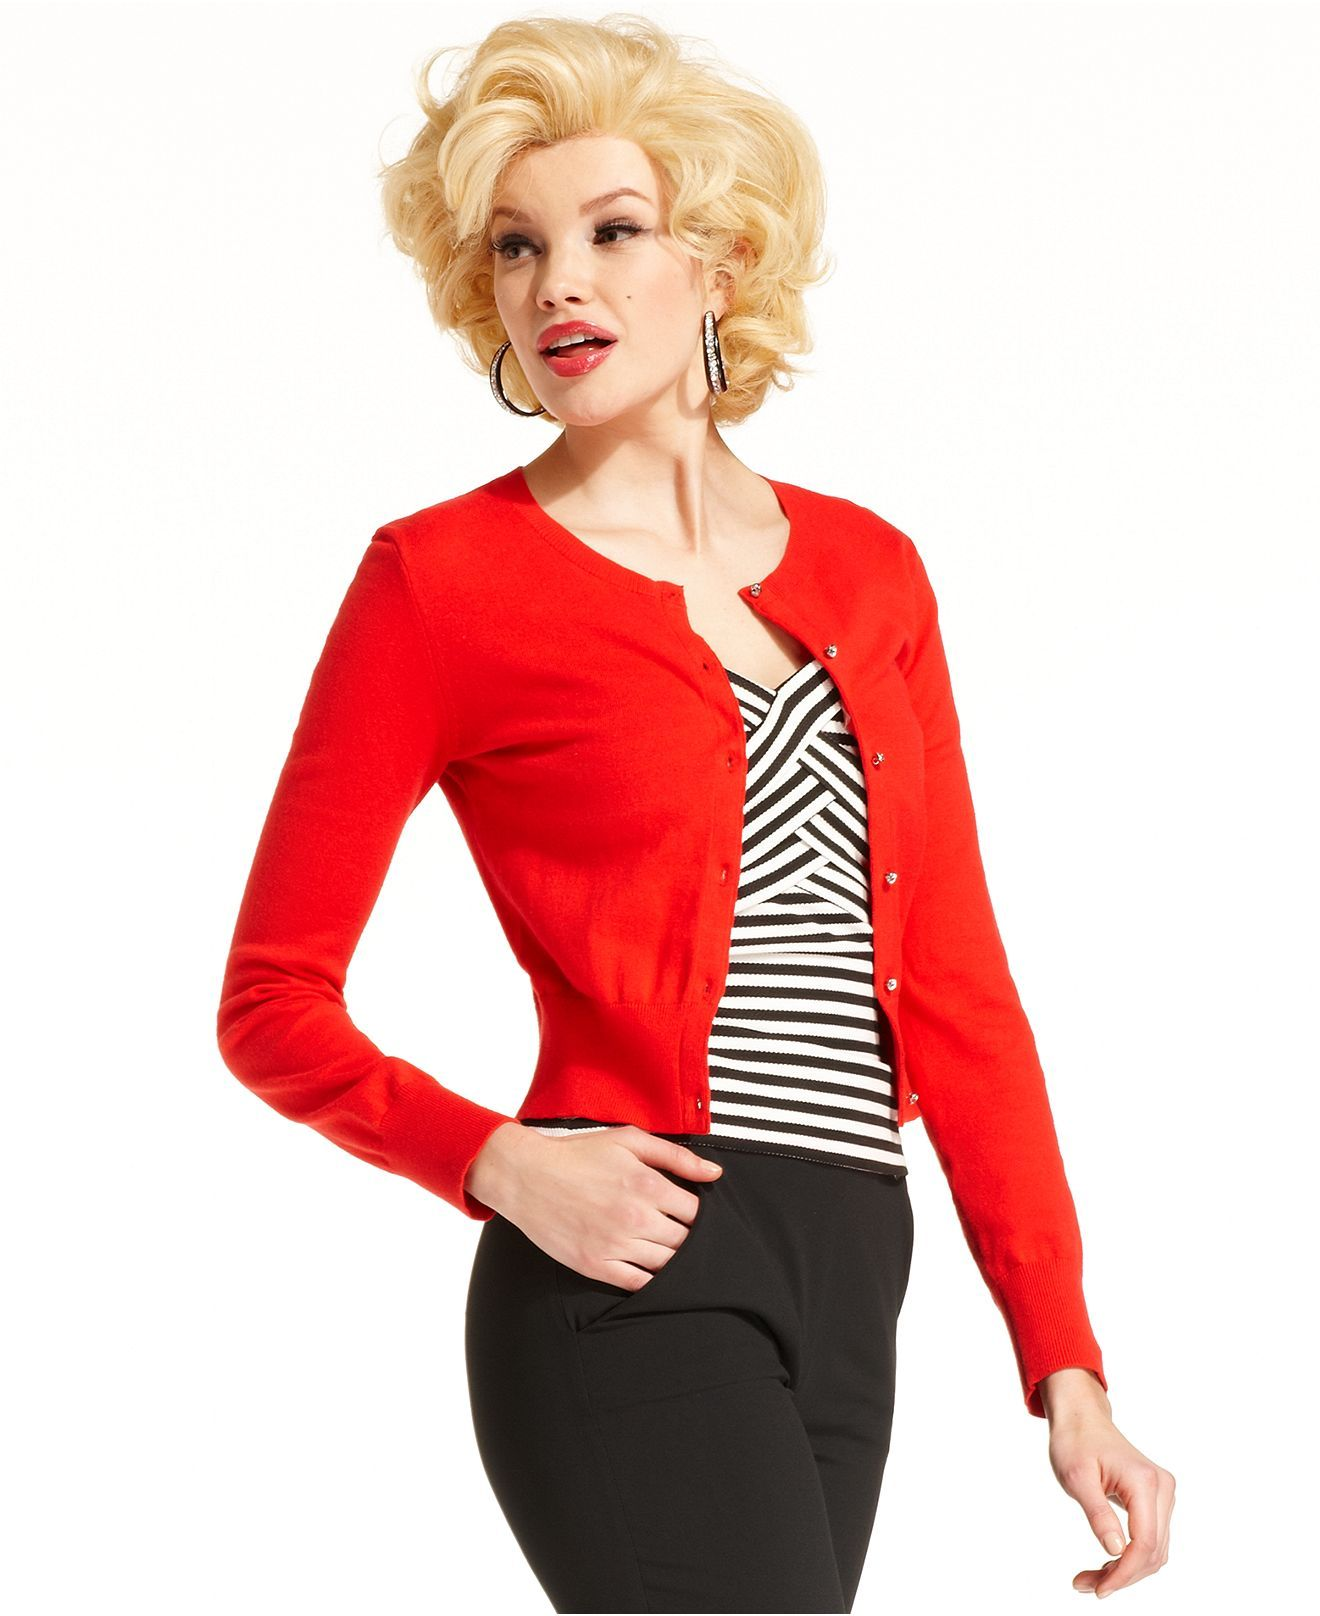 Marilyn Monroe Juniors Sweater, Long Sleeve Cropped Cardigan ...